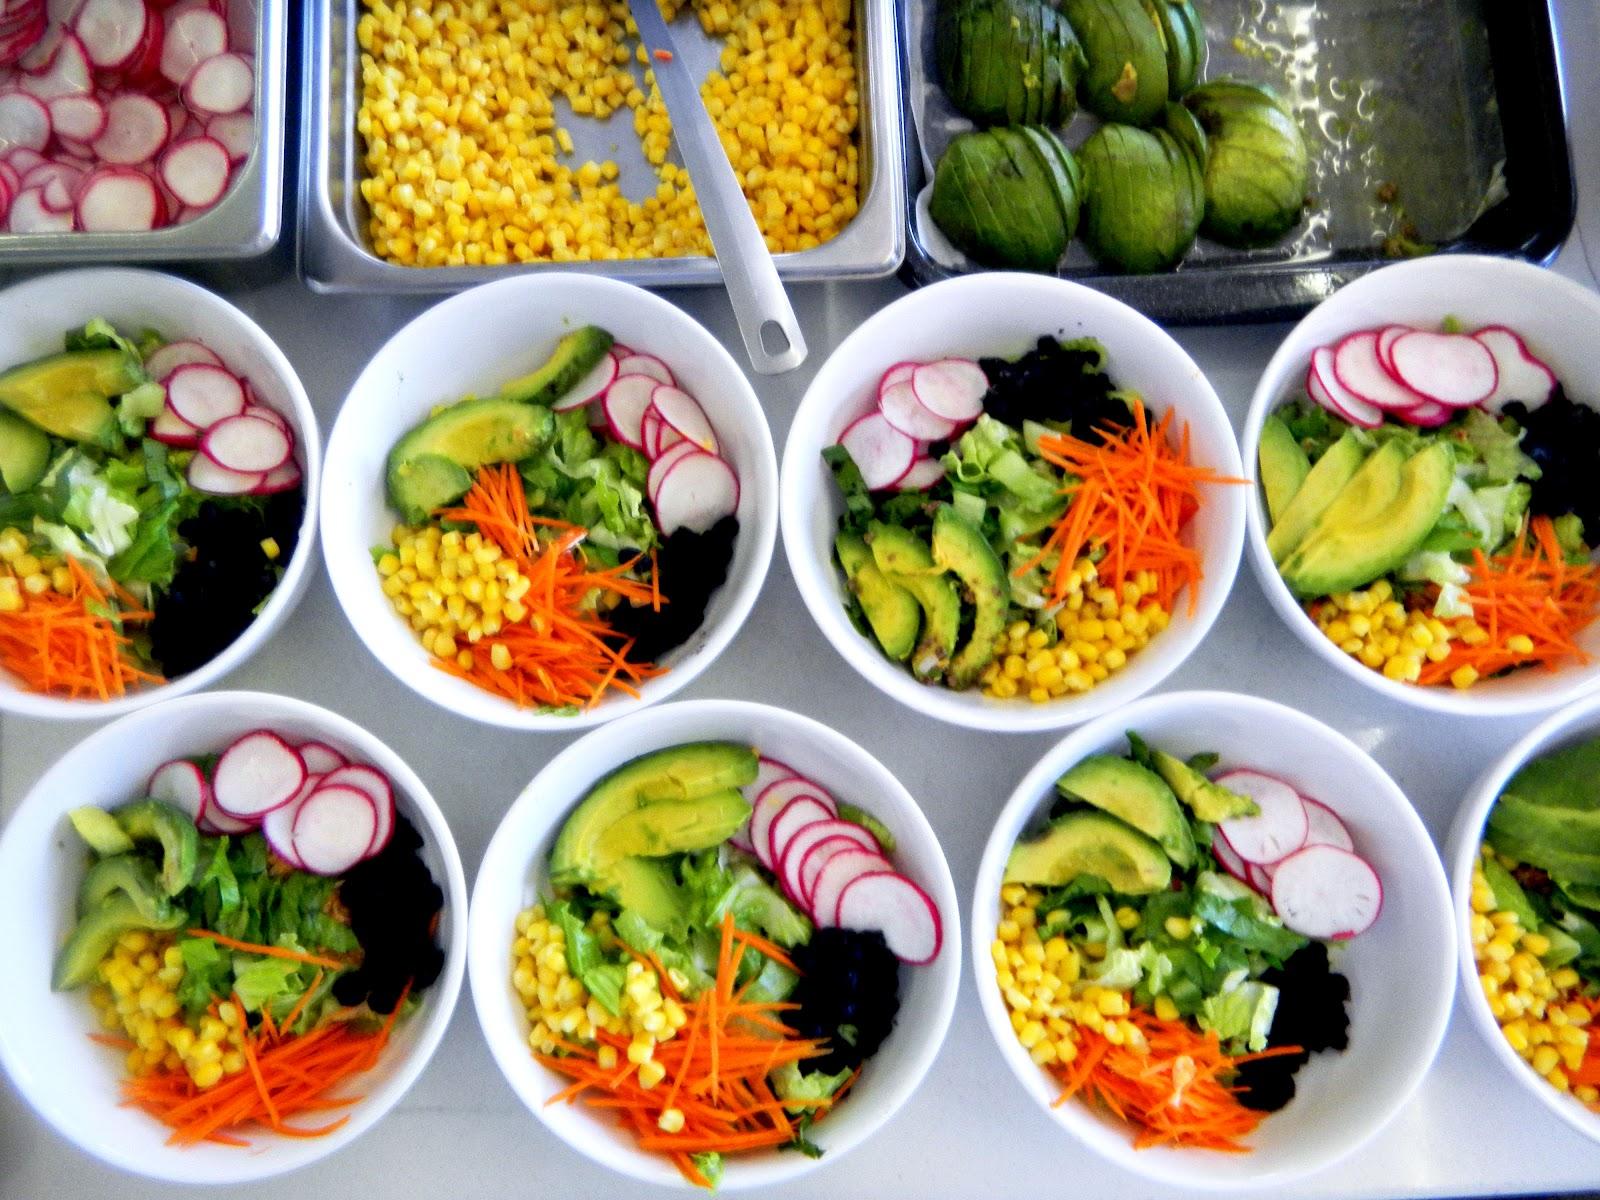 Taco salad bowls with Spanish rice - Cherry on my Sundae